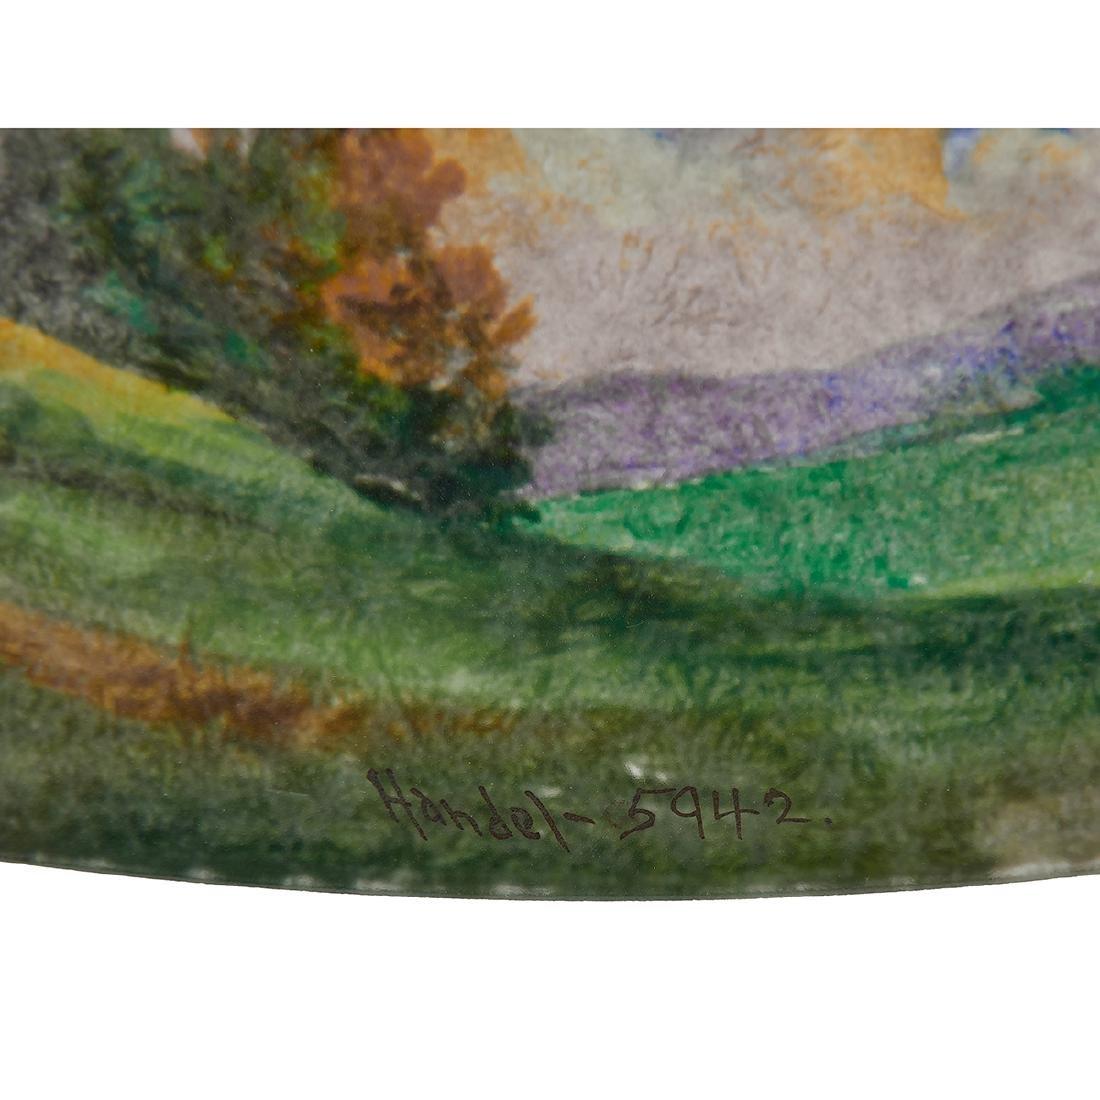 Handel, Obverse Painted Landscape Table Lamp - 3